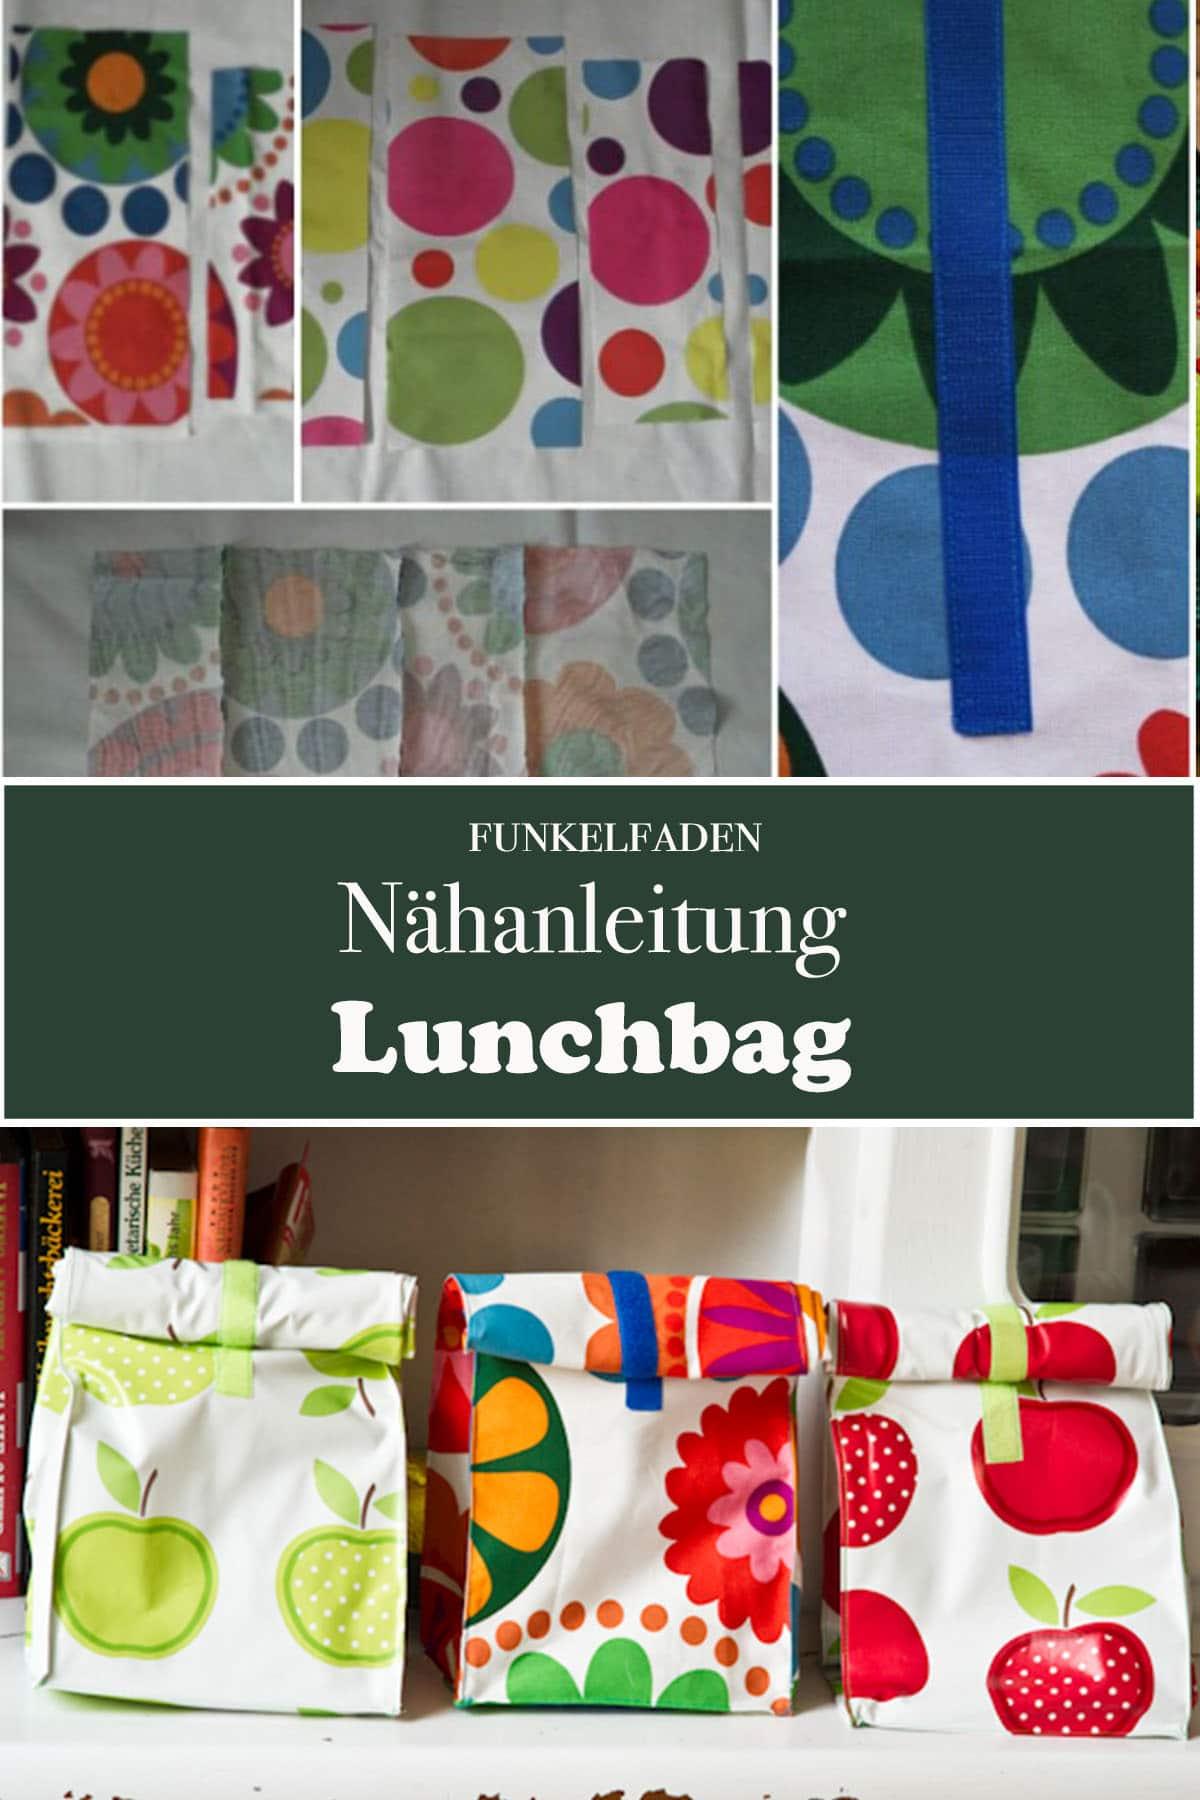 Nähanleitung Lunchbag